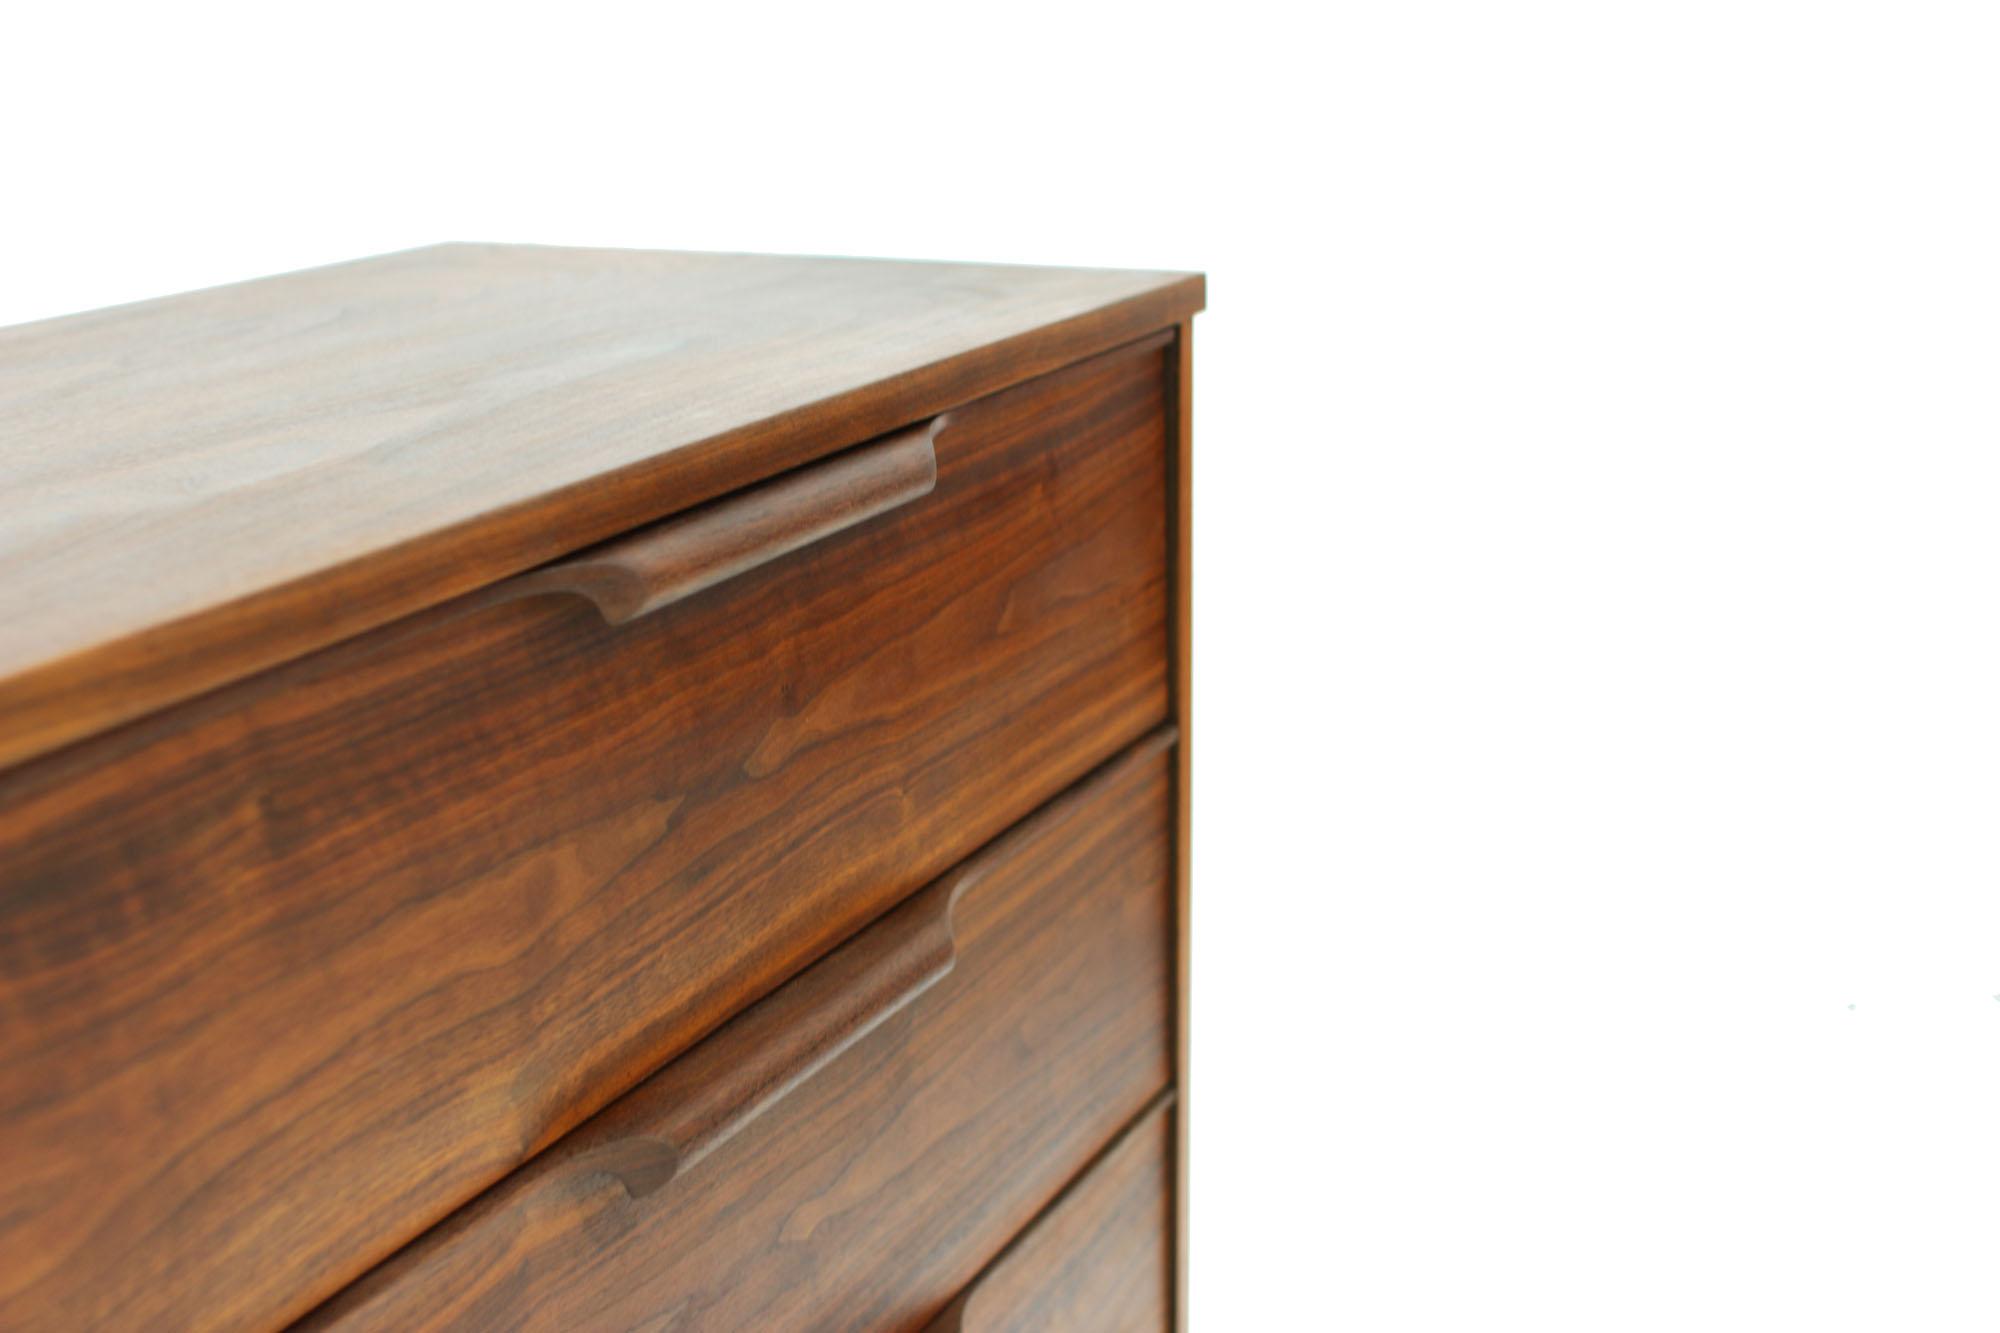 Retro 1960s Walnut Tall Dresser with Sculptural Handles (1).jpg